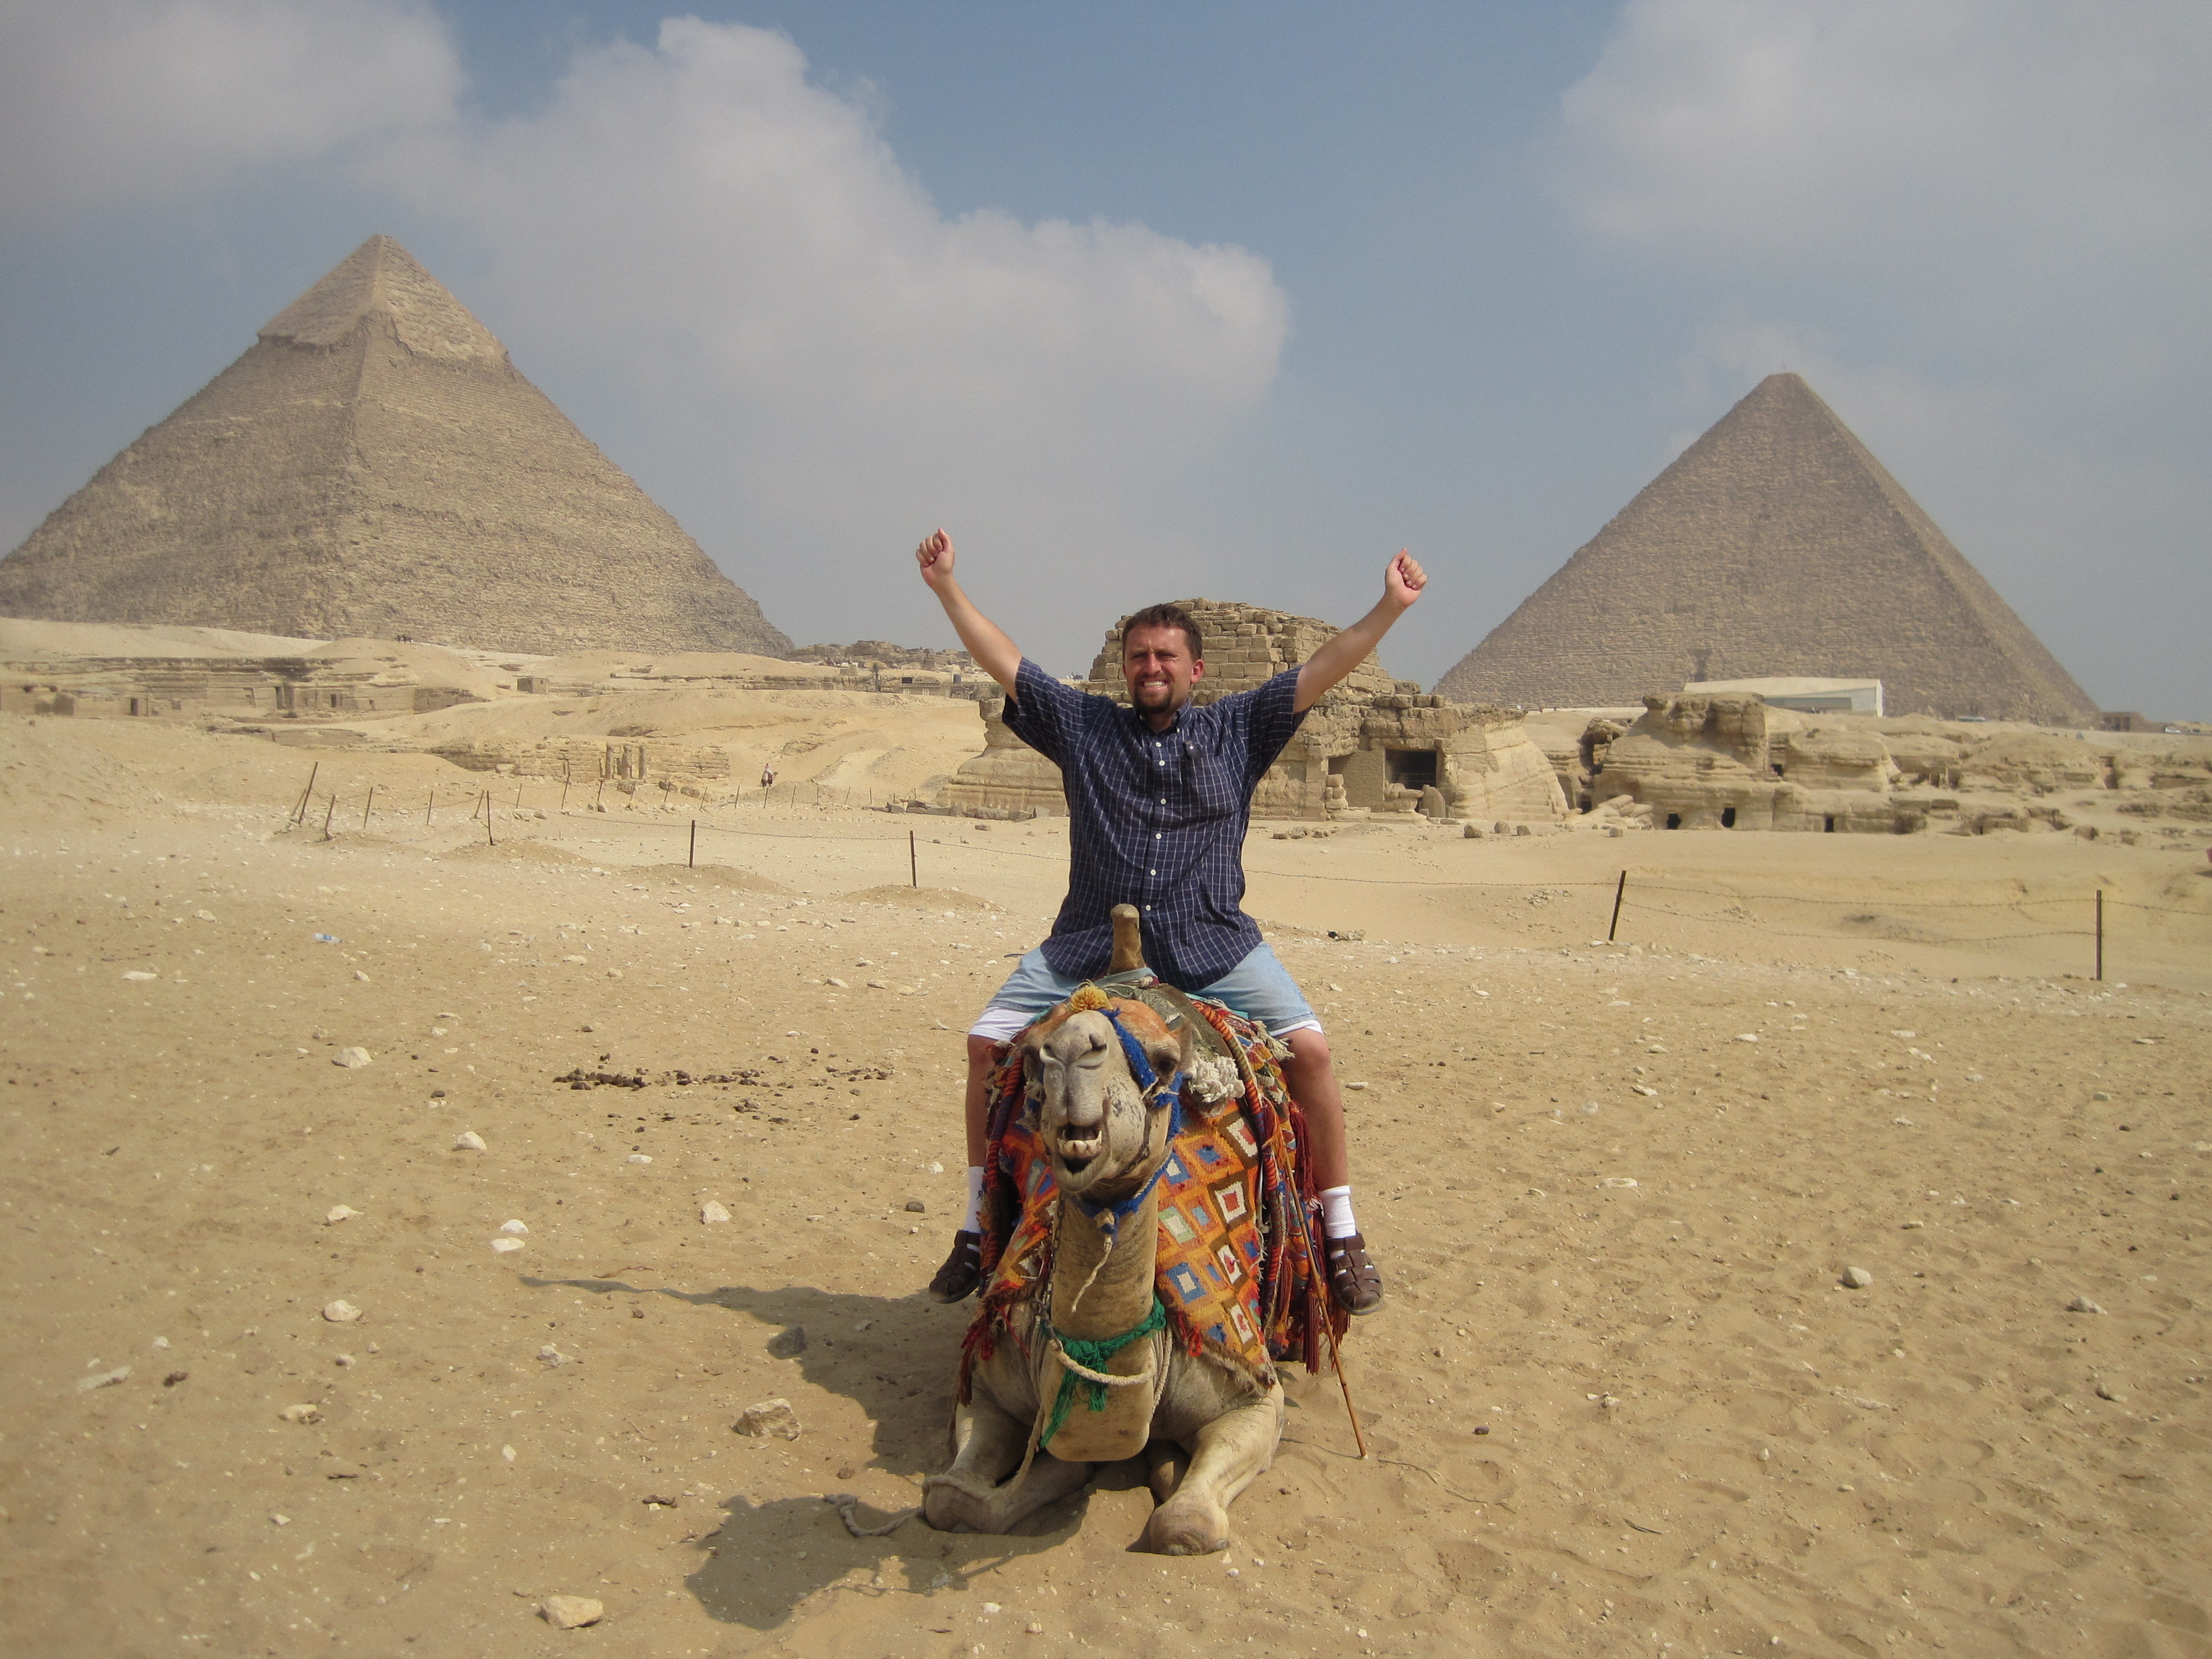 Nathaniel Lambert sit on a camel in Egypt. (Nathaniel Lambert)